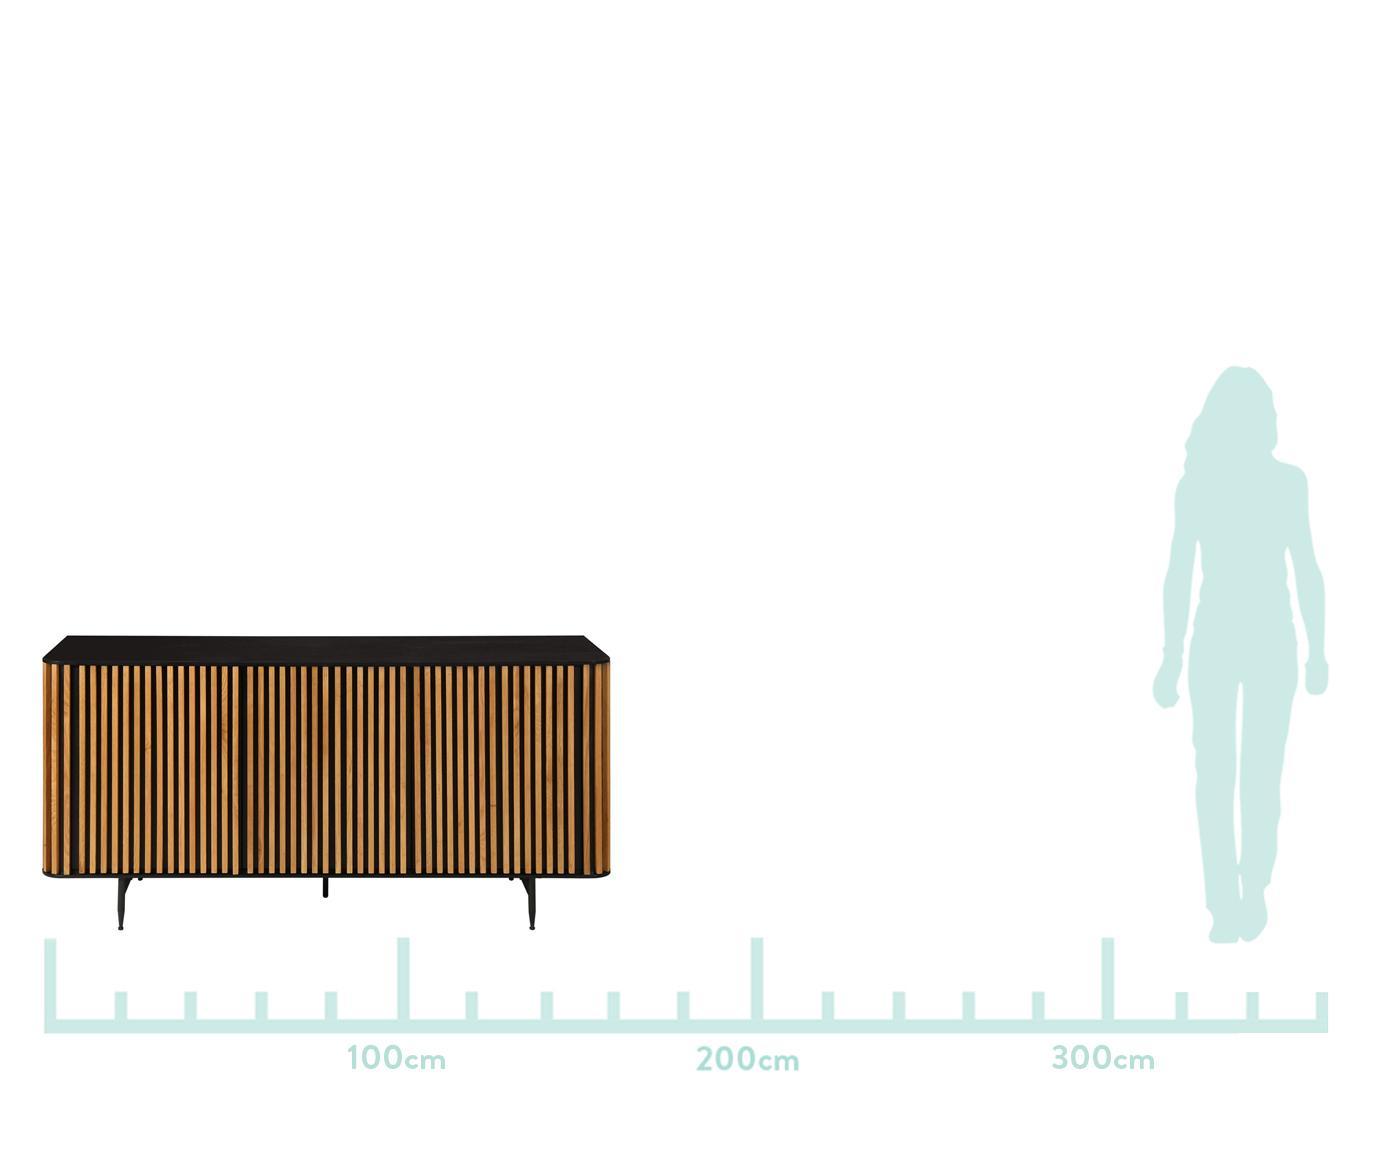 Aparador en roble de diseño Linea, Estructura: tablero de fibras de dens, Patas: metal pintado, Negro, roble, An 159 x Al 74 cm